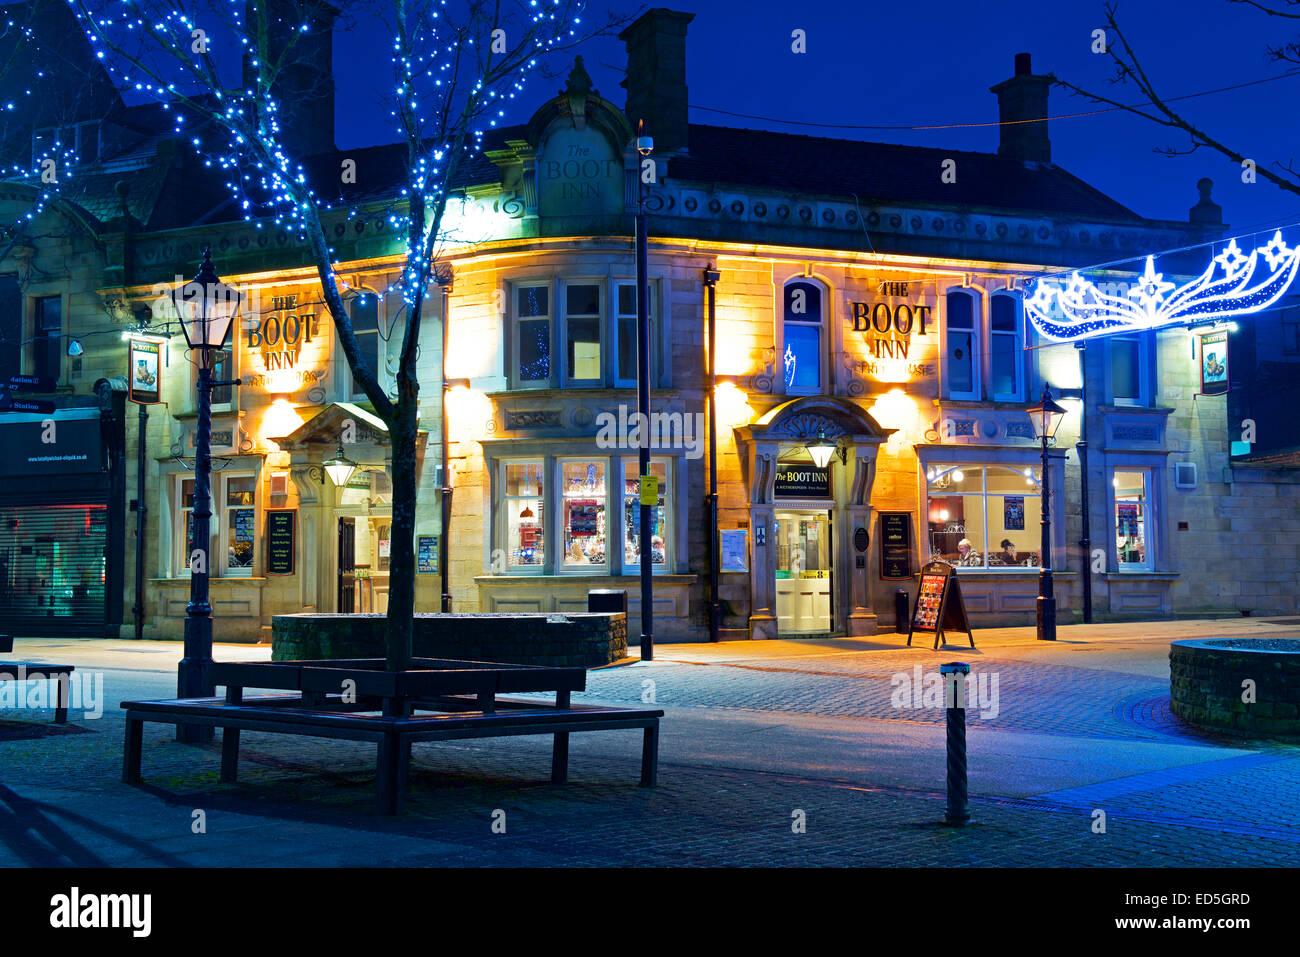 The Boot, a Wetherspoons pub, Burnley, Lancashire, England UK - Stock Image